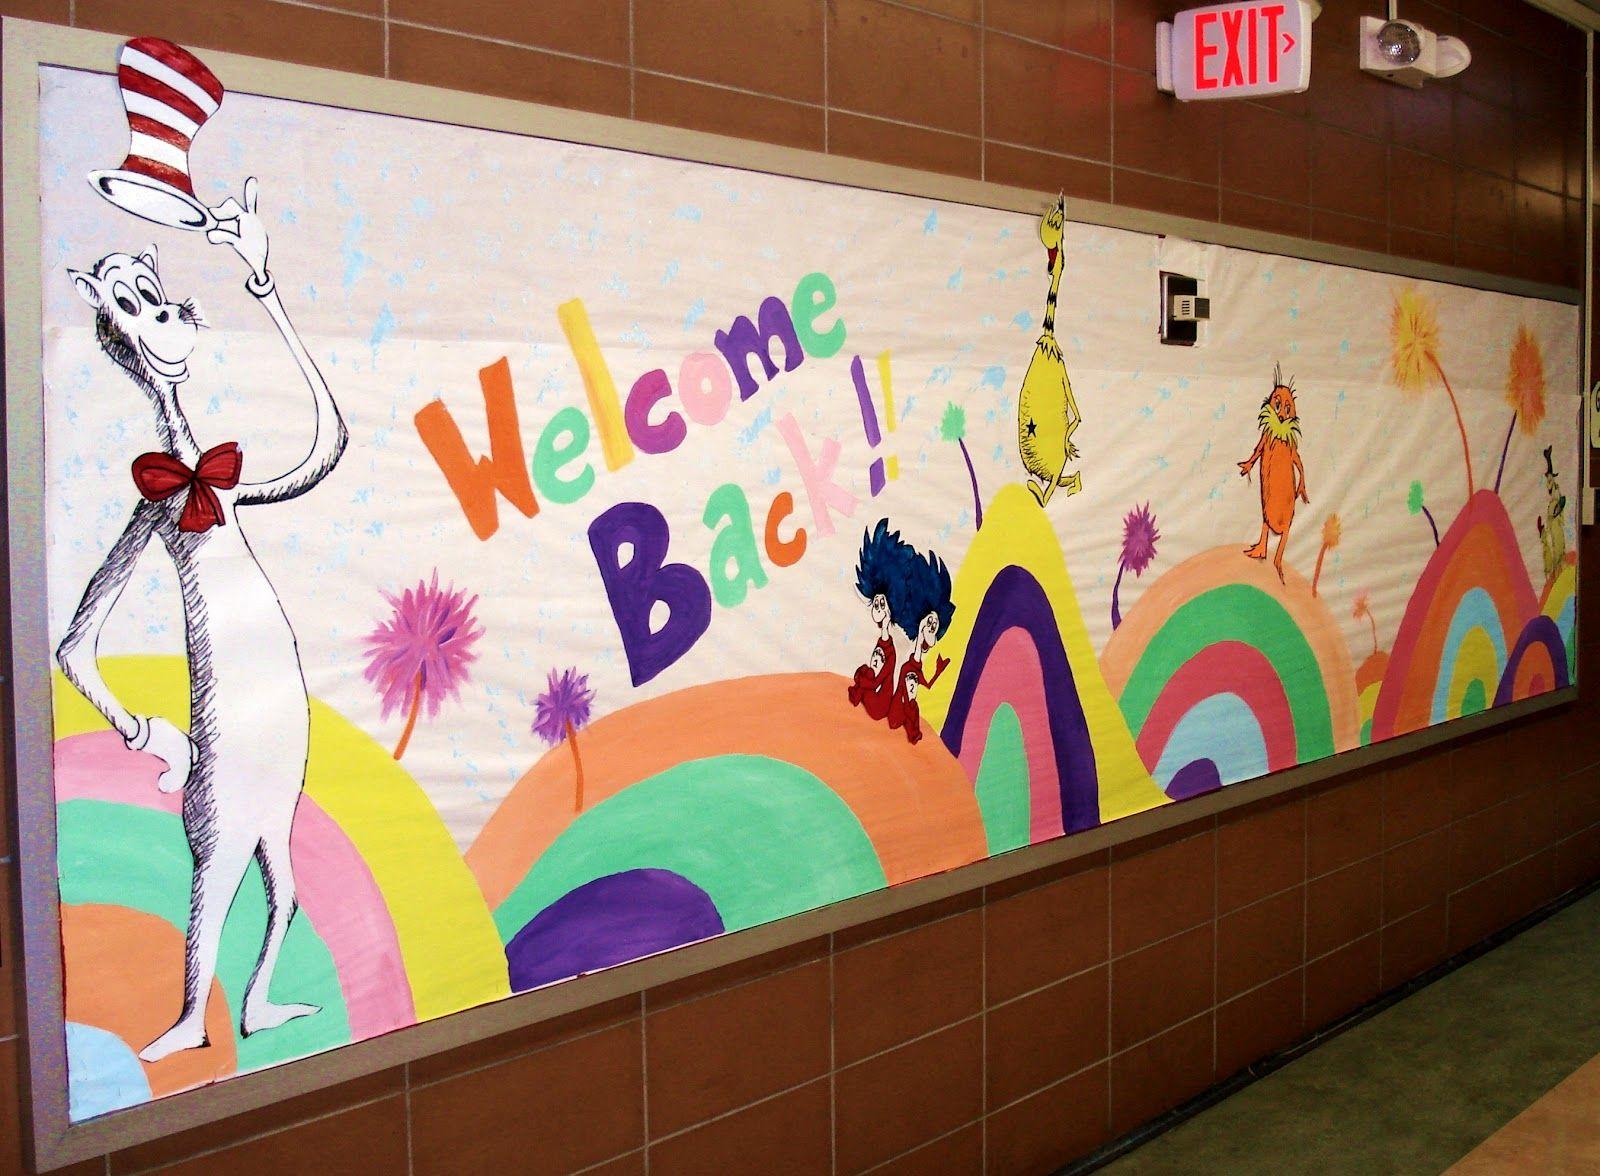 Dr Seuss Bulletin Board Ideas Artmuse67 My Welcome